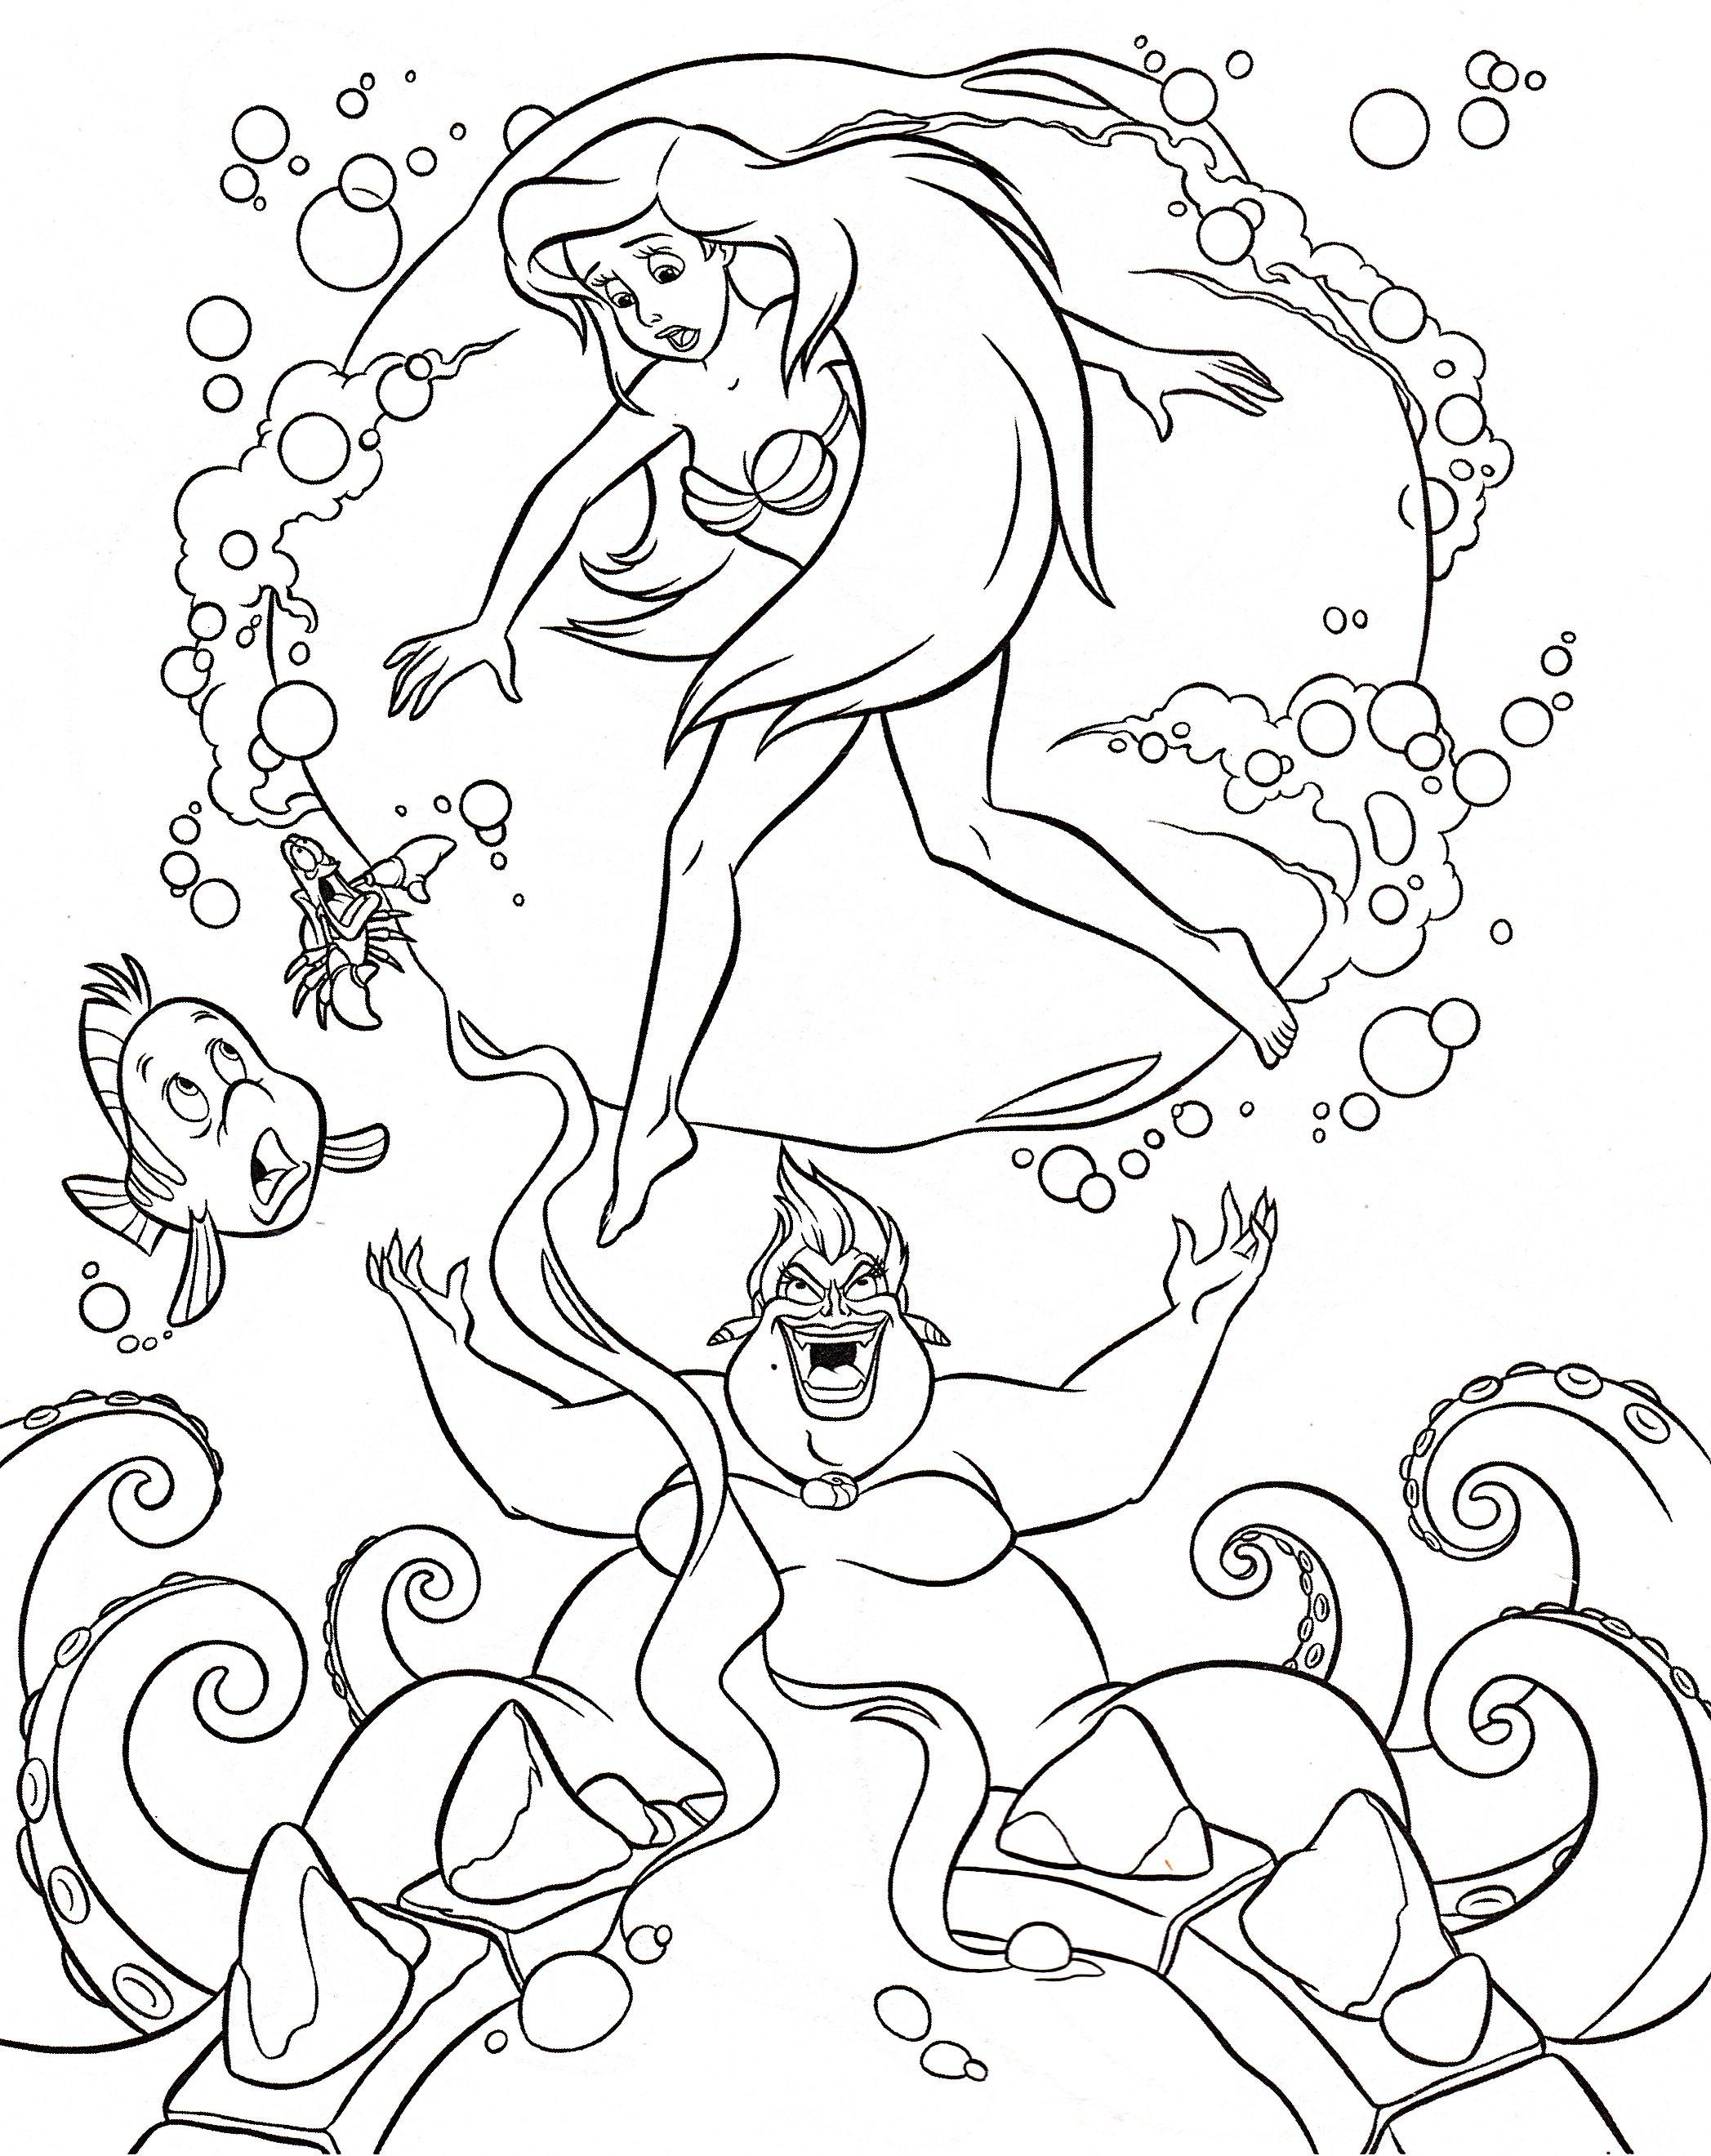 Walt Disney Characters Photo Walt Disney Coloring Pages Flounder Sebastian Princess Ariel Ursula Ariel Coloring Pages Disney Princess Coloring Pages Disney Coloring Pages